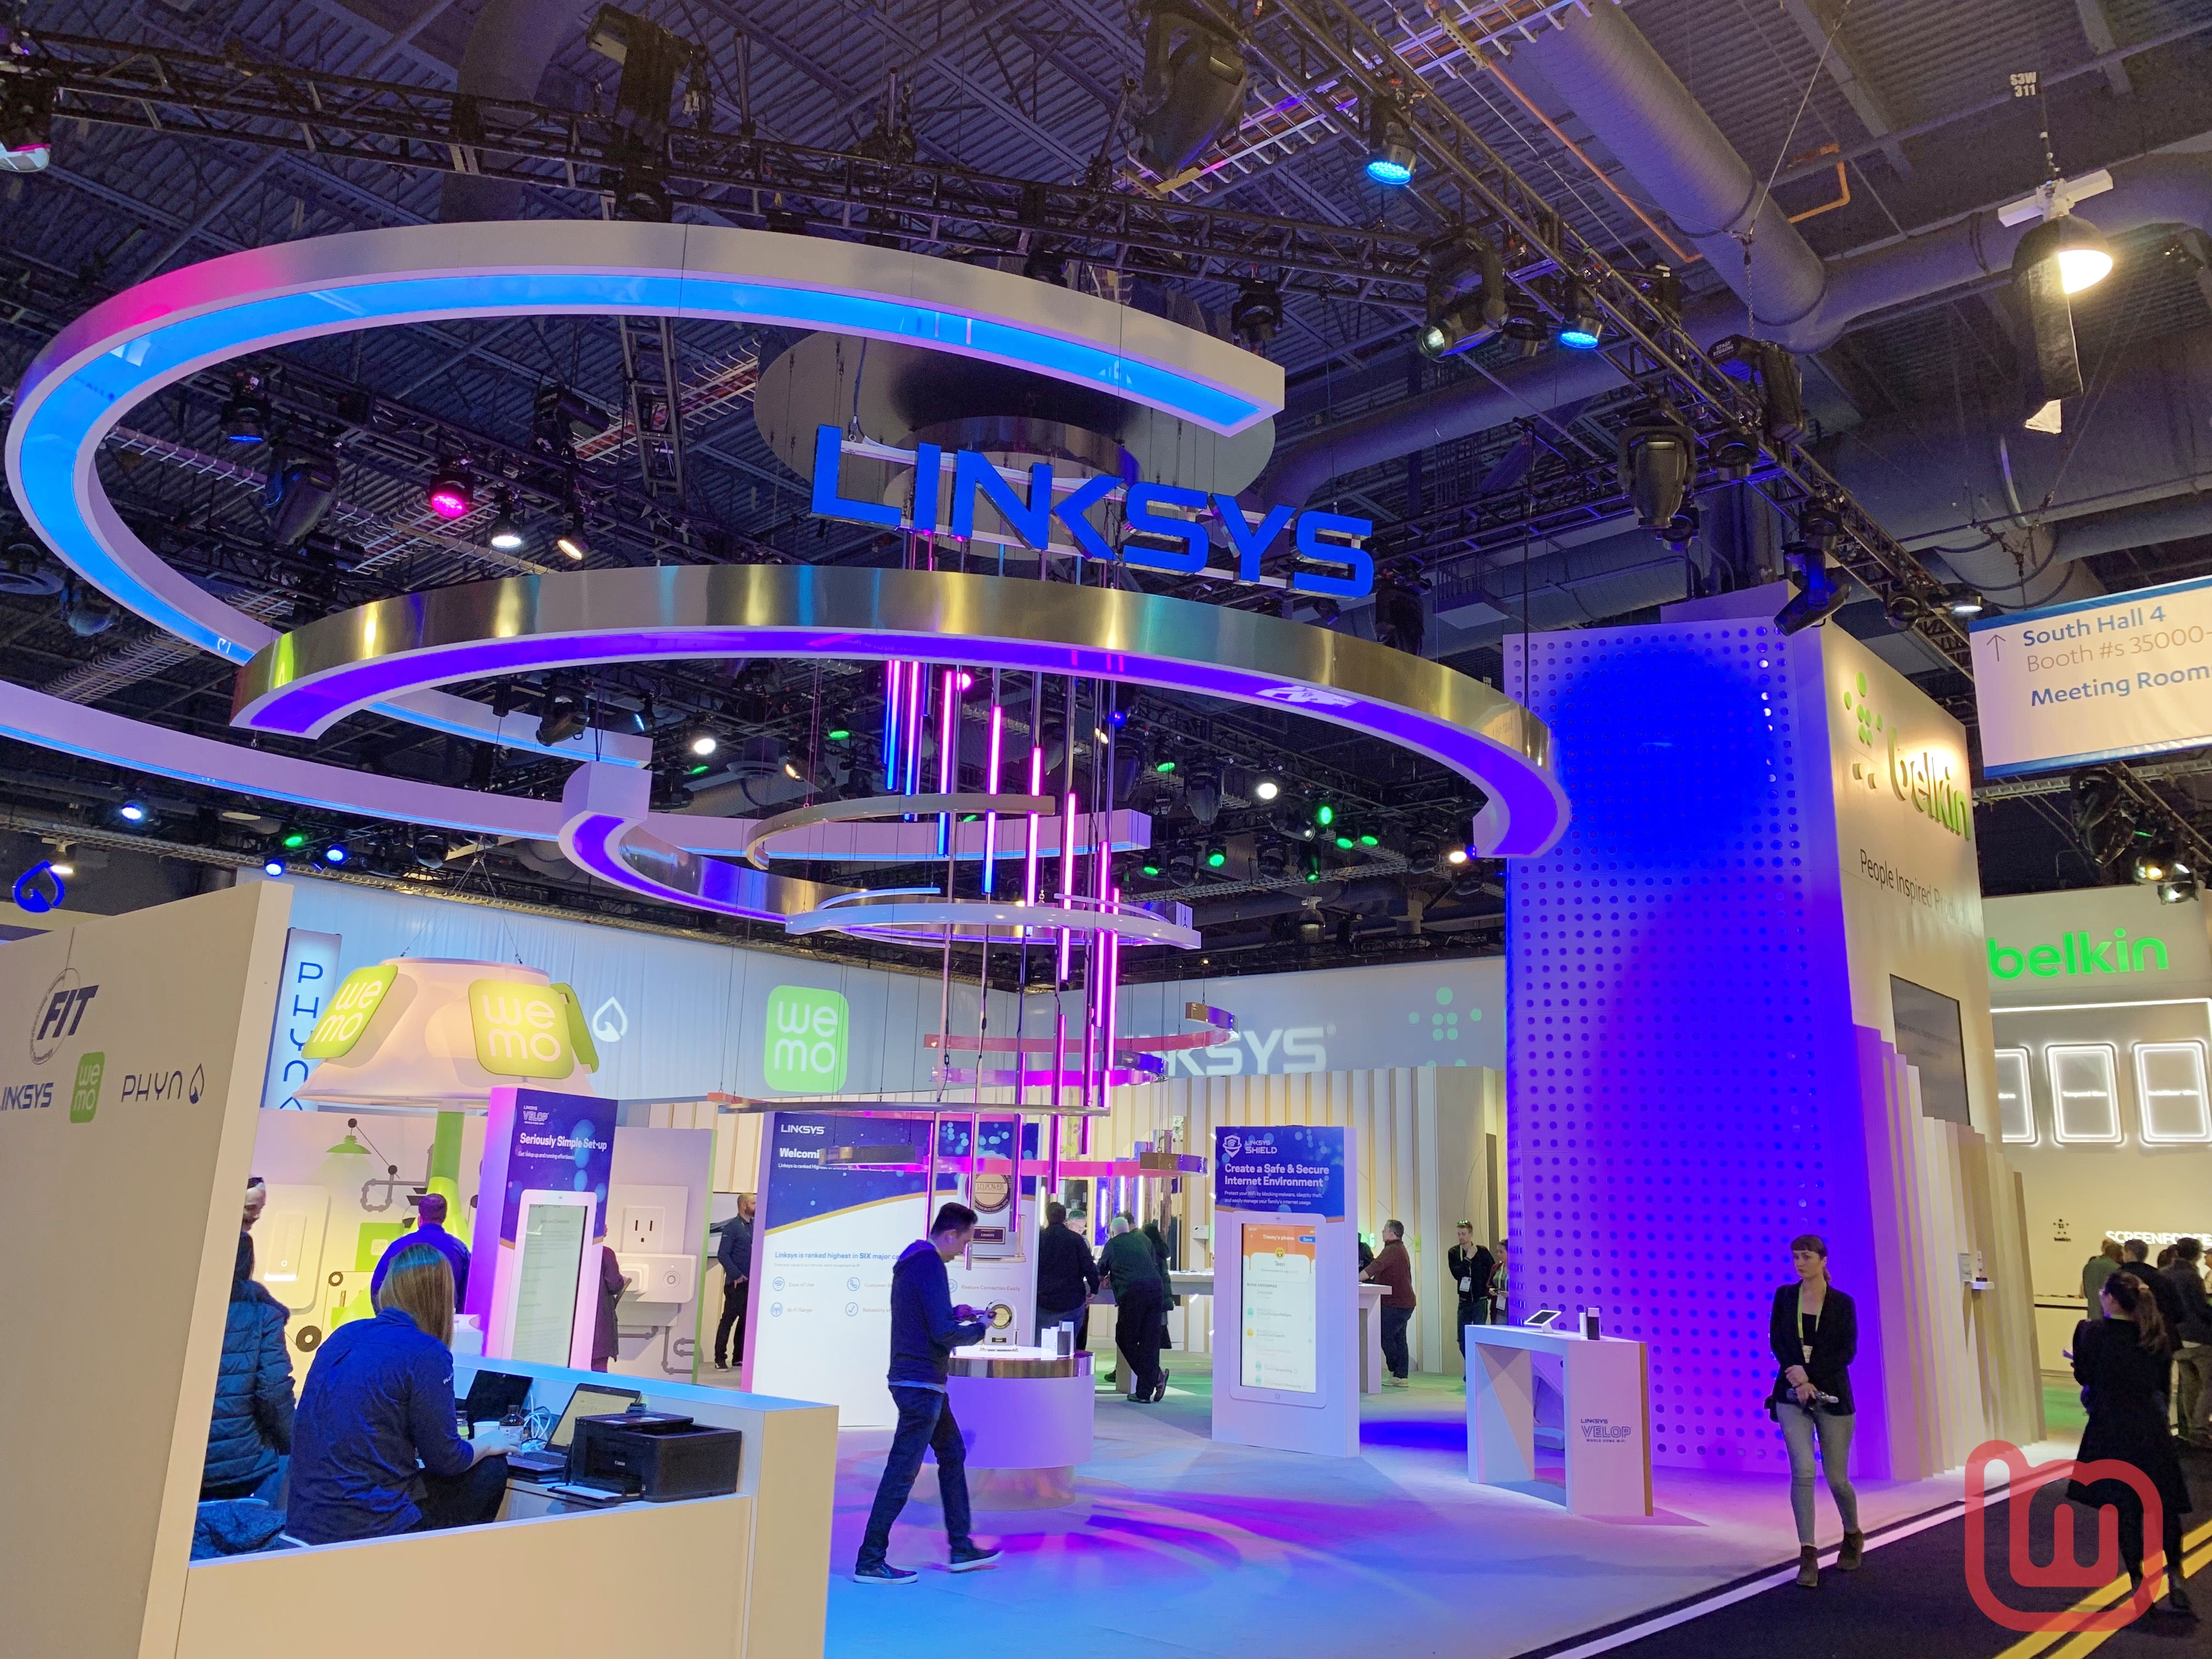 【CES 2019】ベルキン、「USB-C to Lightningケーブル」や同社のブランドLinksys、Wemoなどの製品を展示